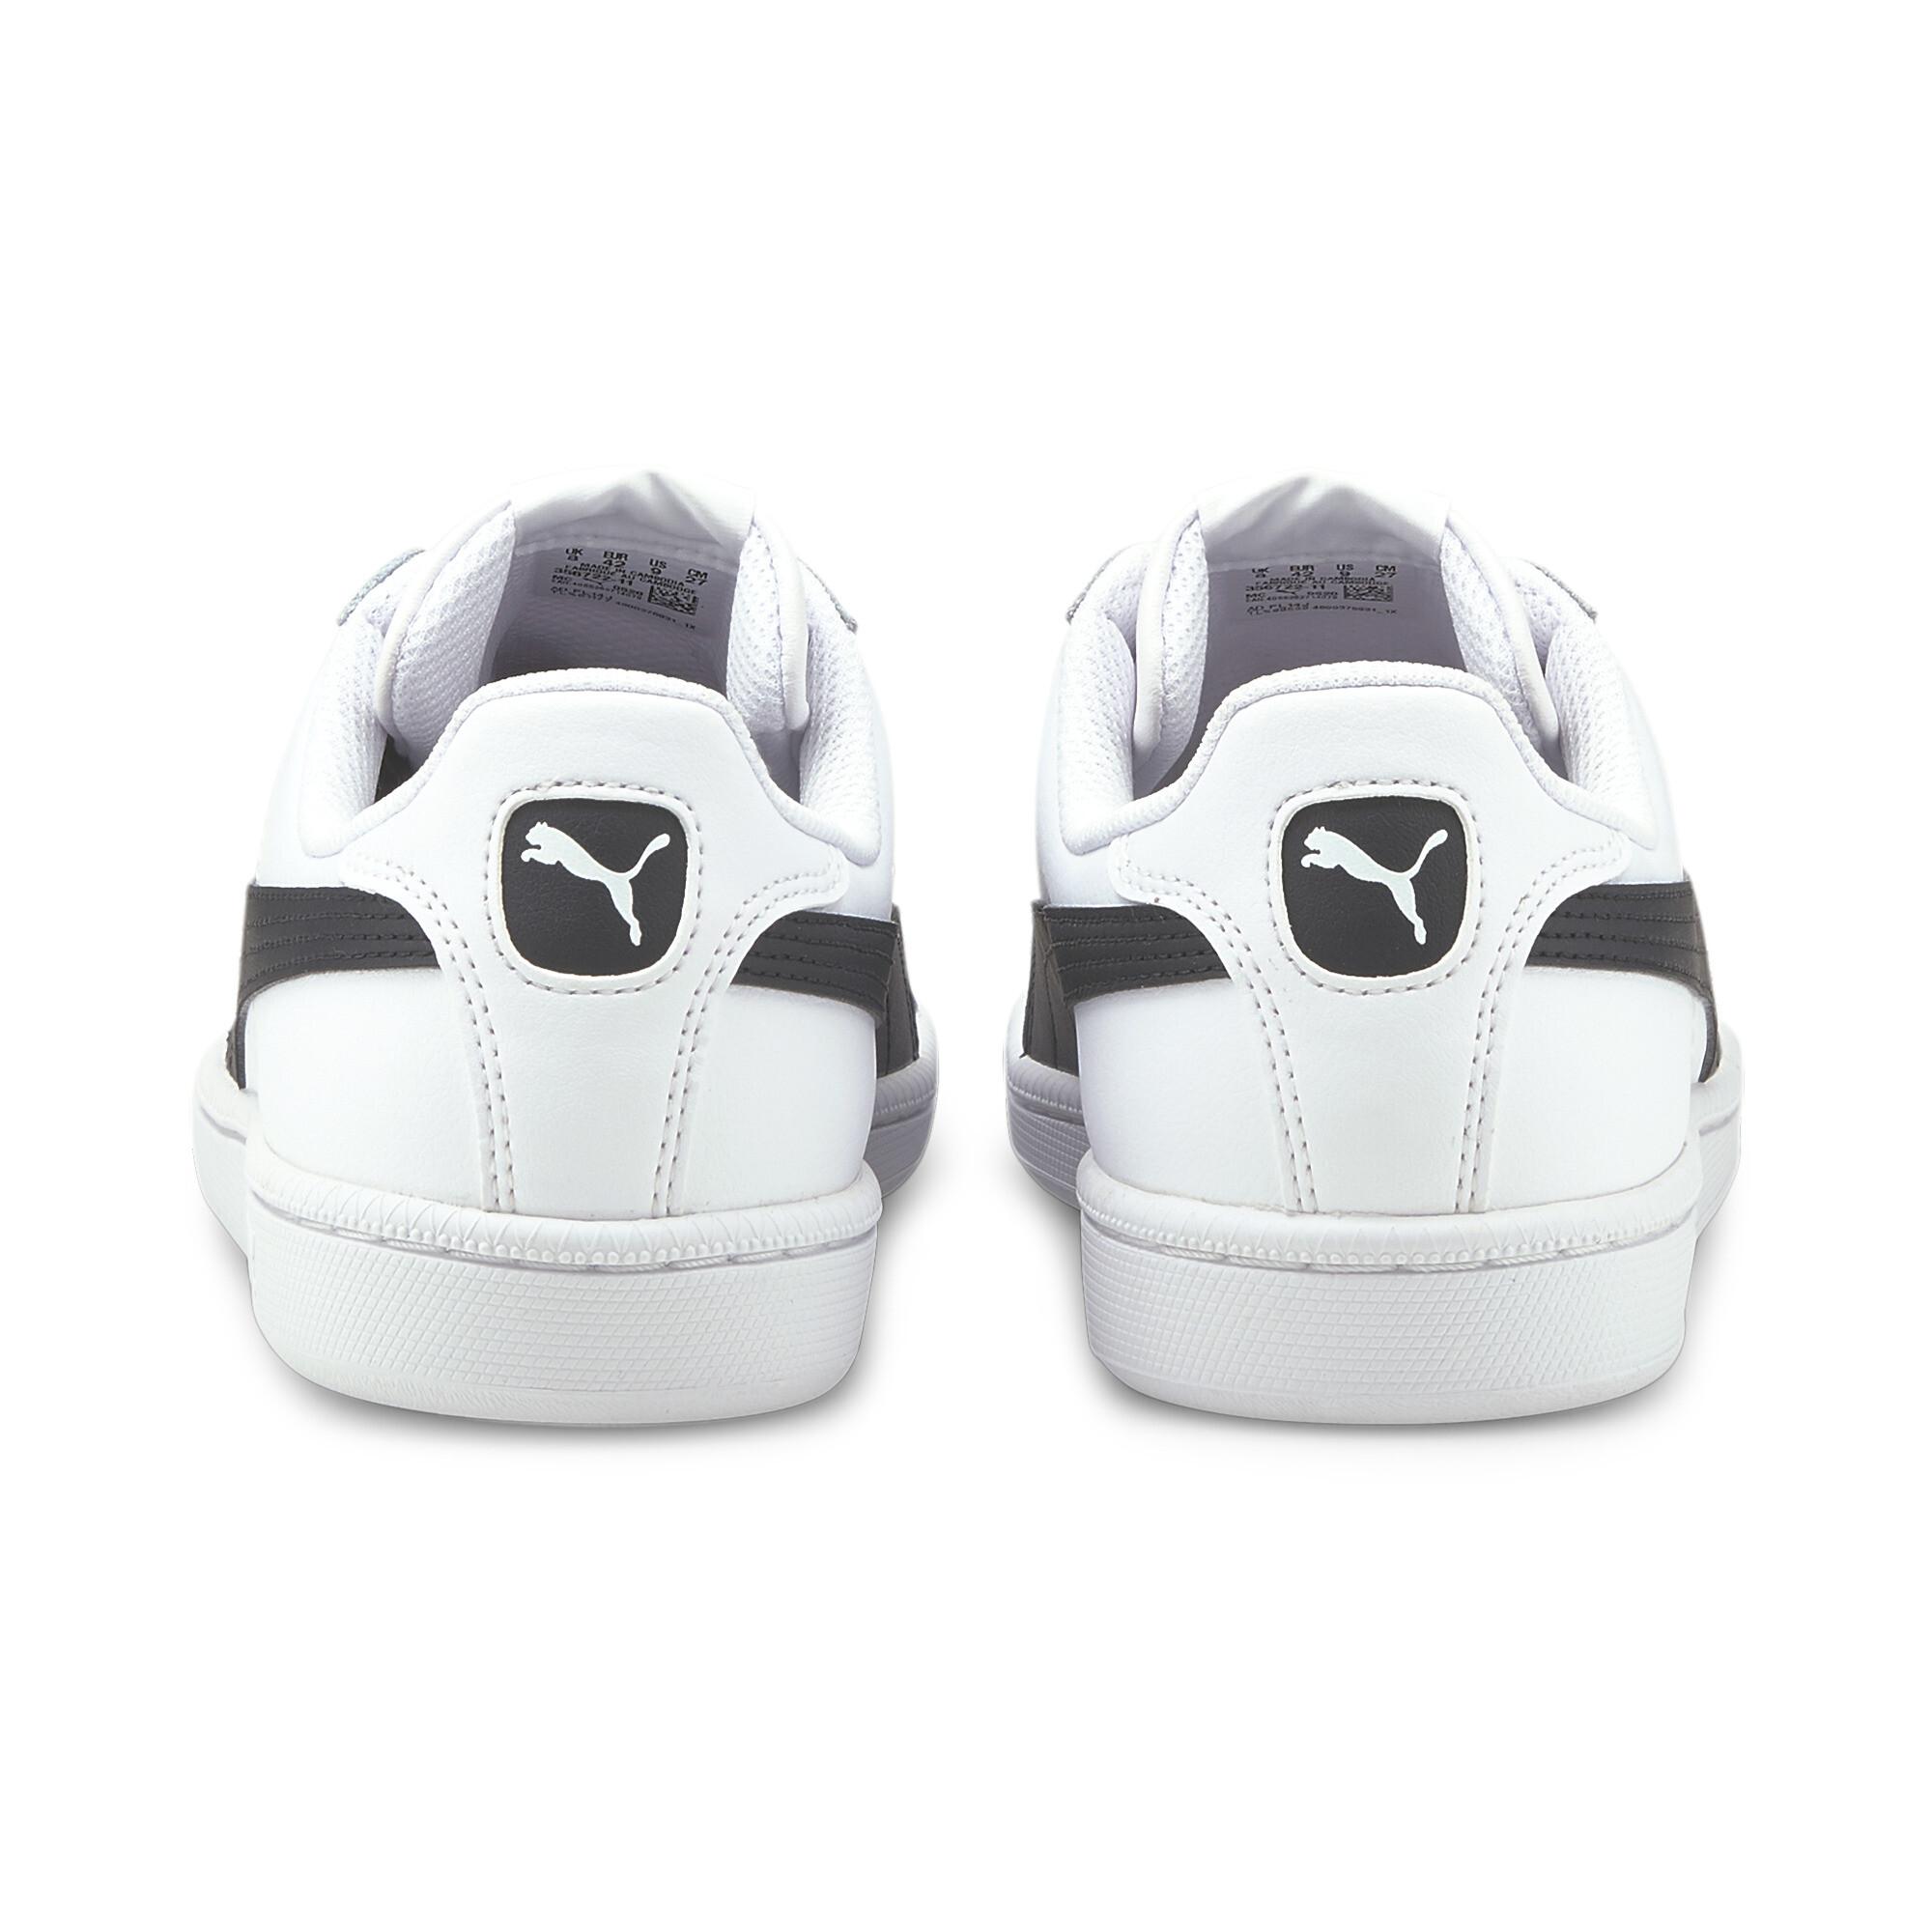 Indexbild 8 - PUMA Smash Trainers Schuhe Sneakers Sport Classics Unisex Neu